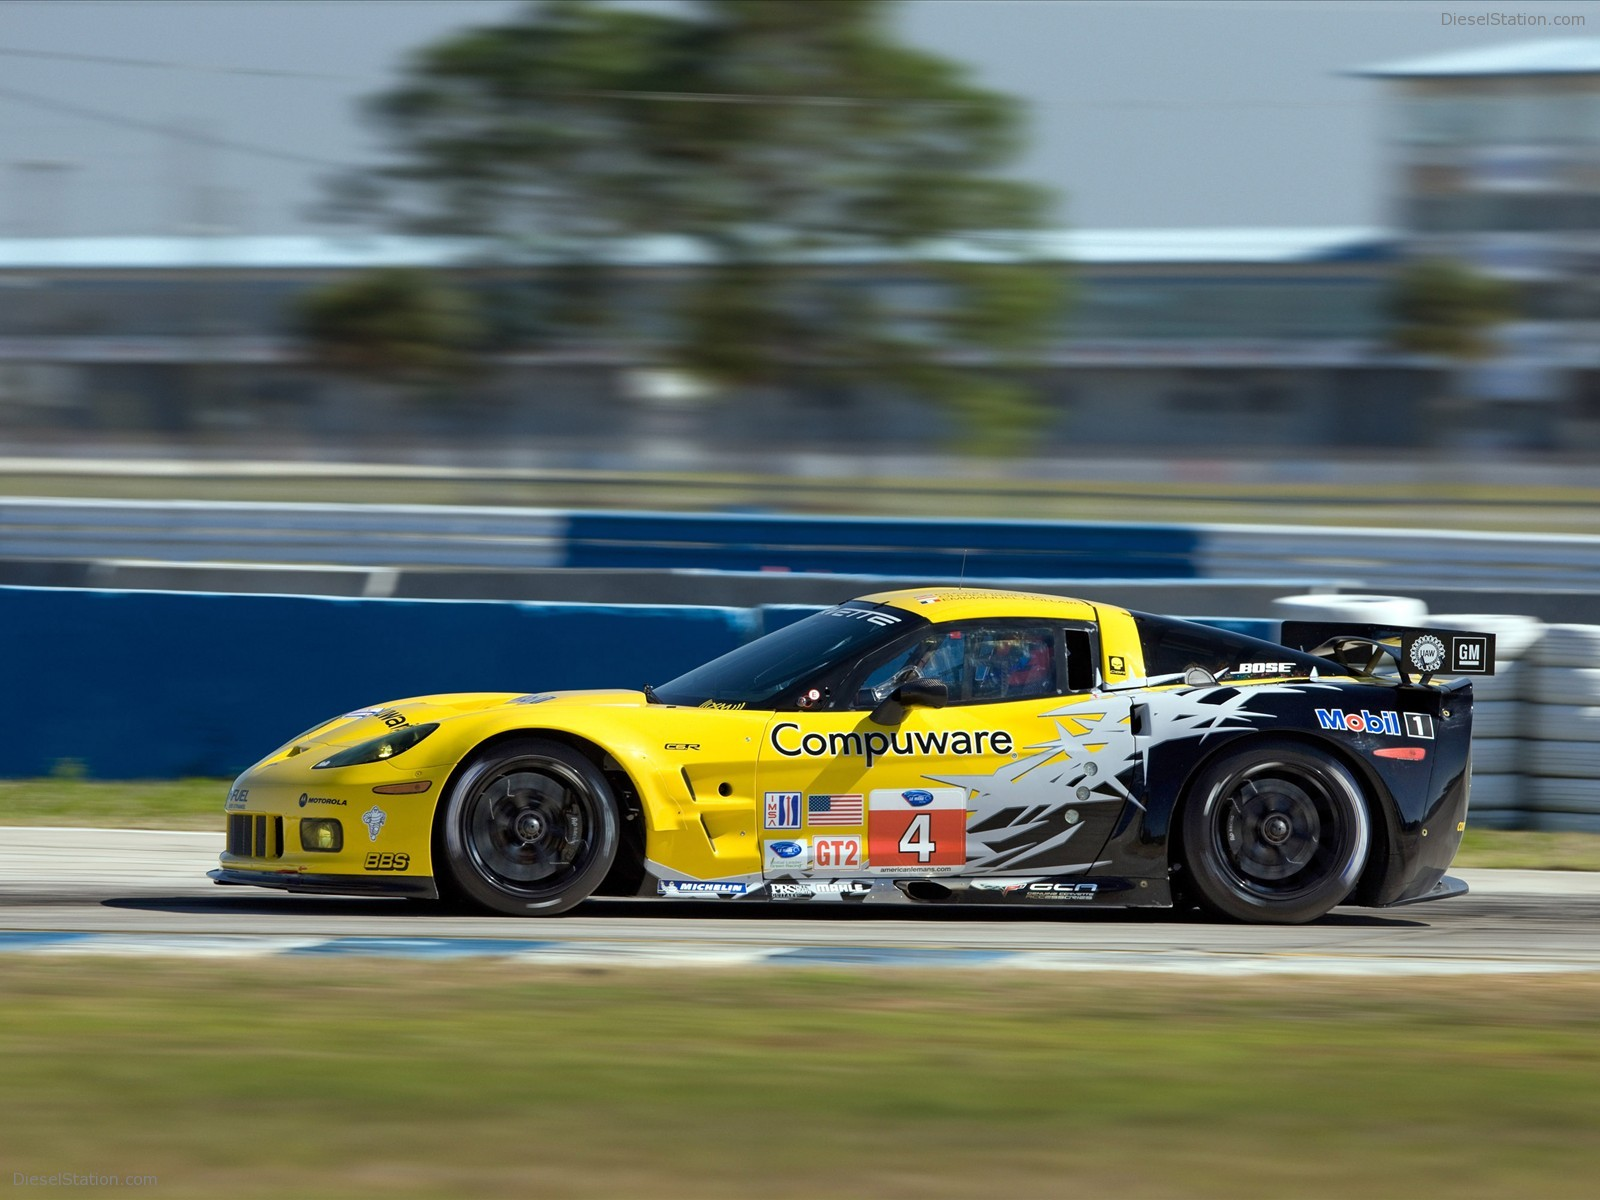 corvette racing sebring cars wallpapers hd hd wallpaper Car Pictures 1600x1200